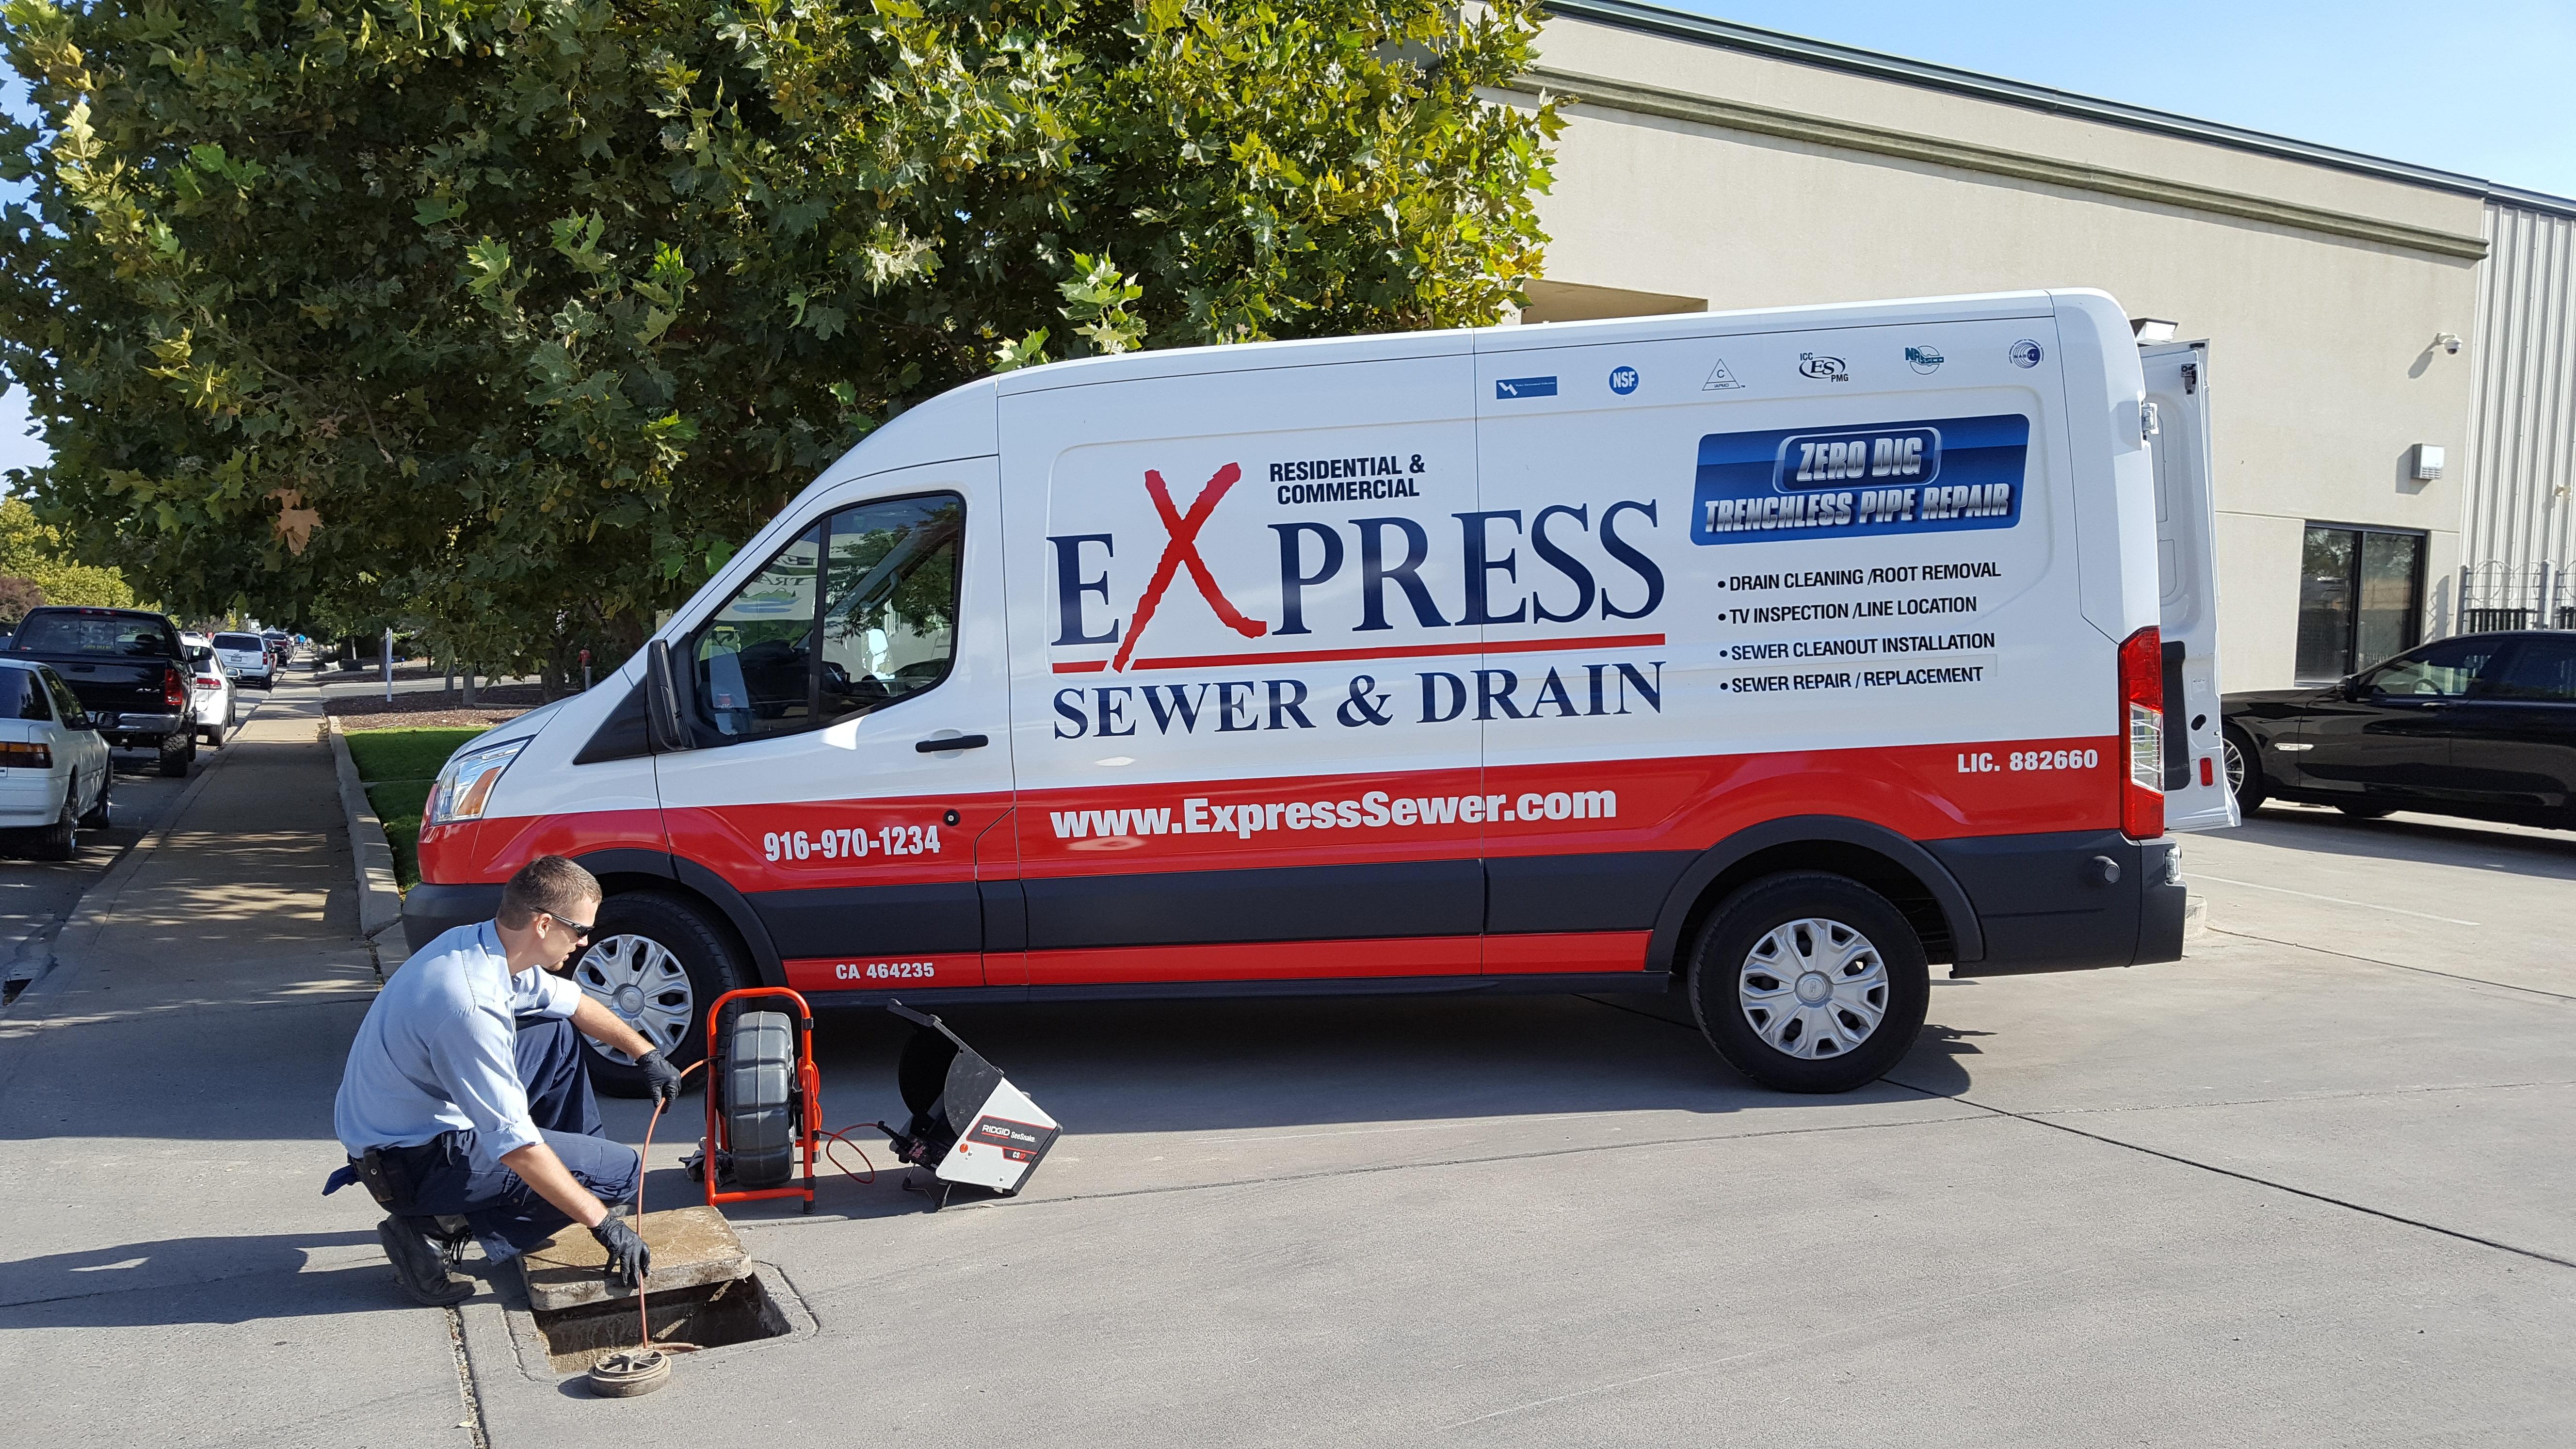 plumbing supply glass bathroom sink sinks square vessel oceana wave jsg cubix store fixtures luxury for sacramento faucets decorative